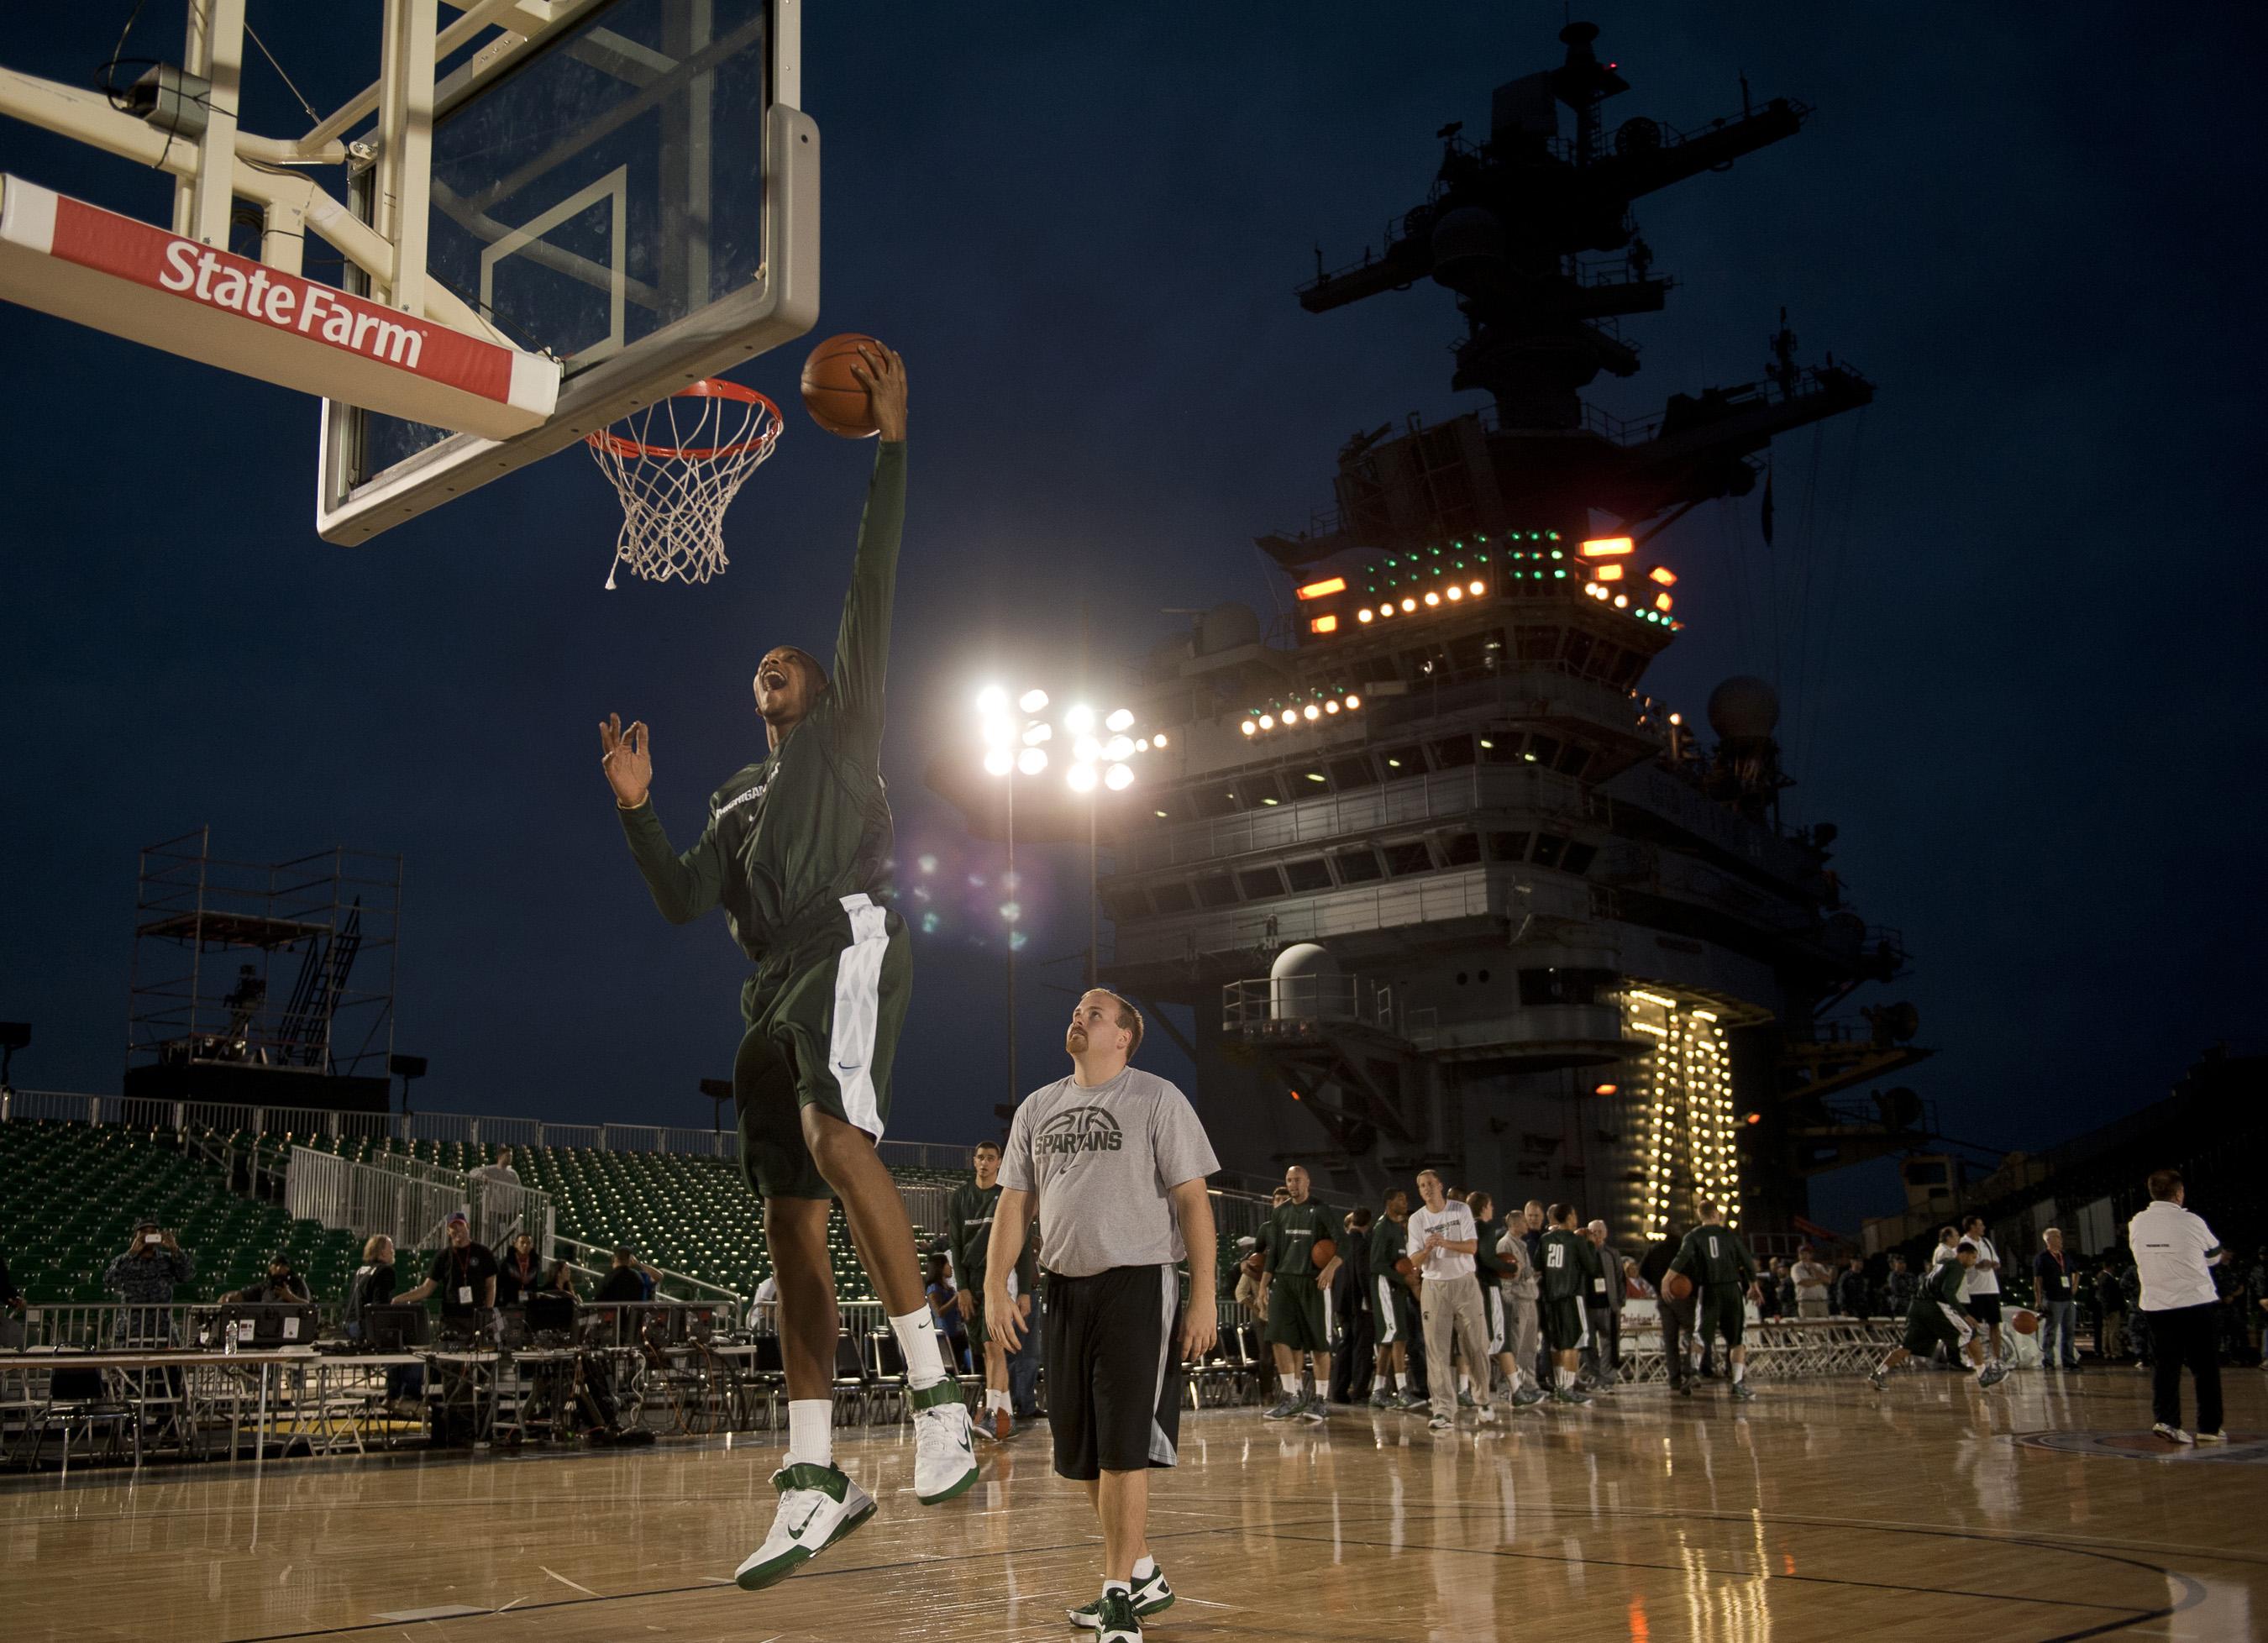 File:us navy 111110-n-dr144-711 michigan state university basketball